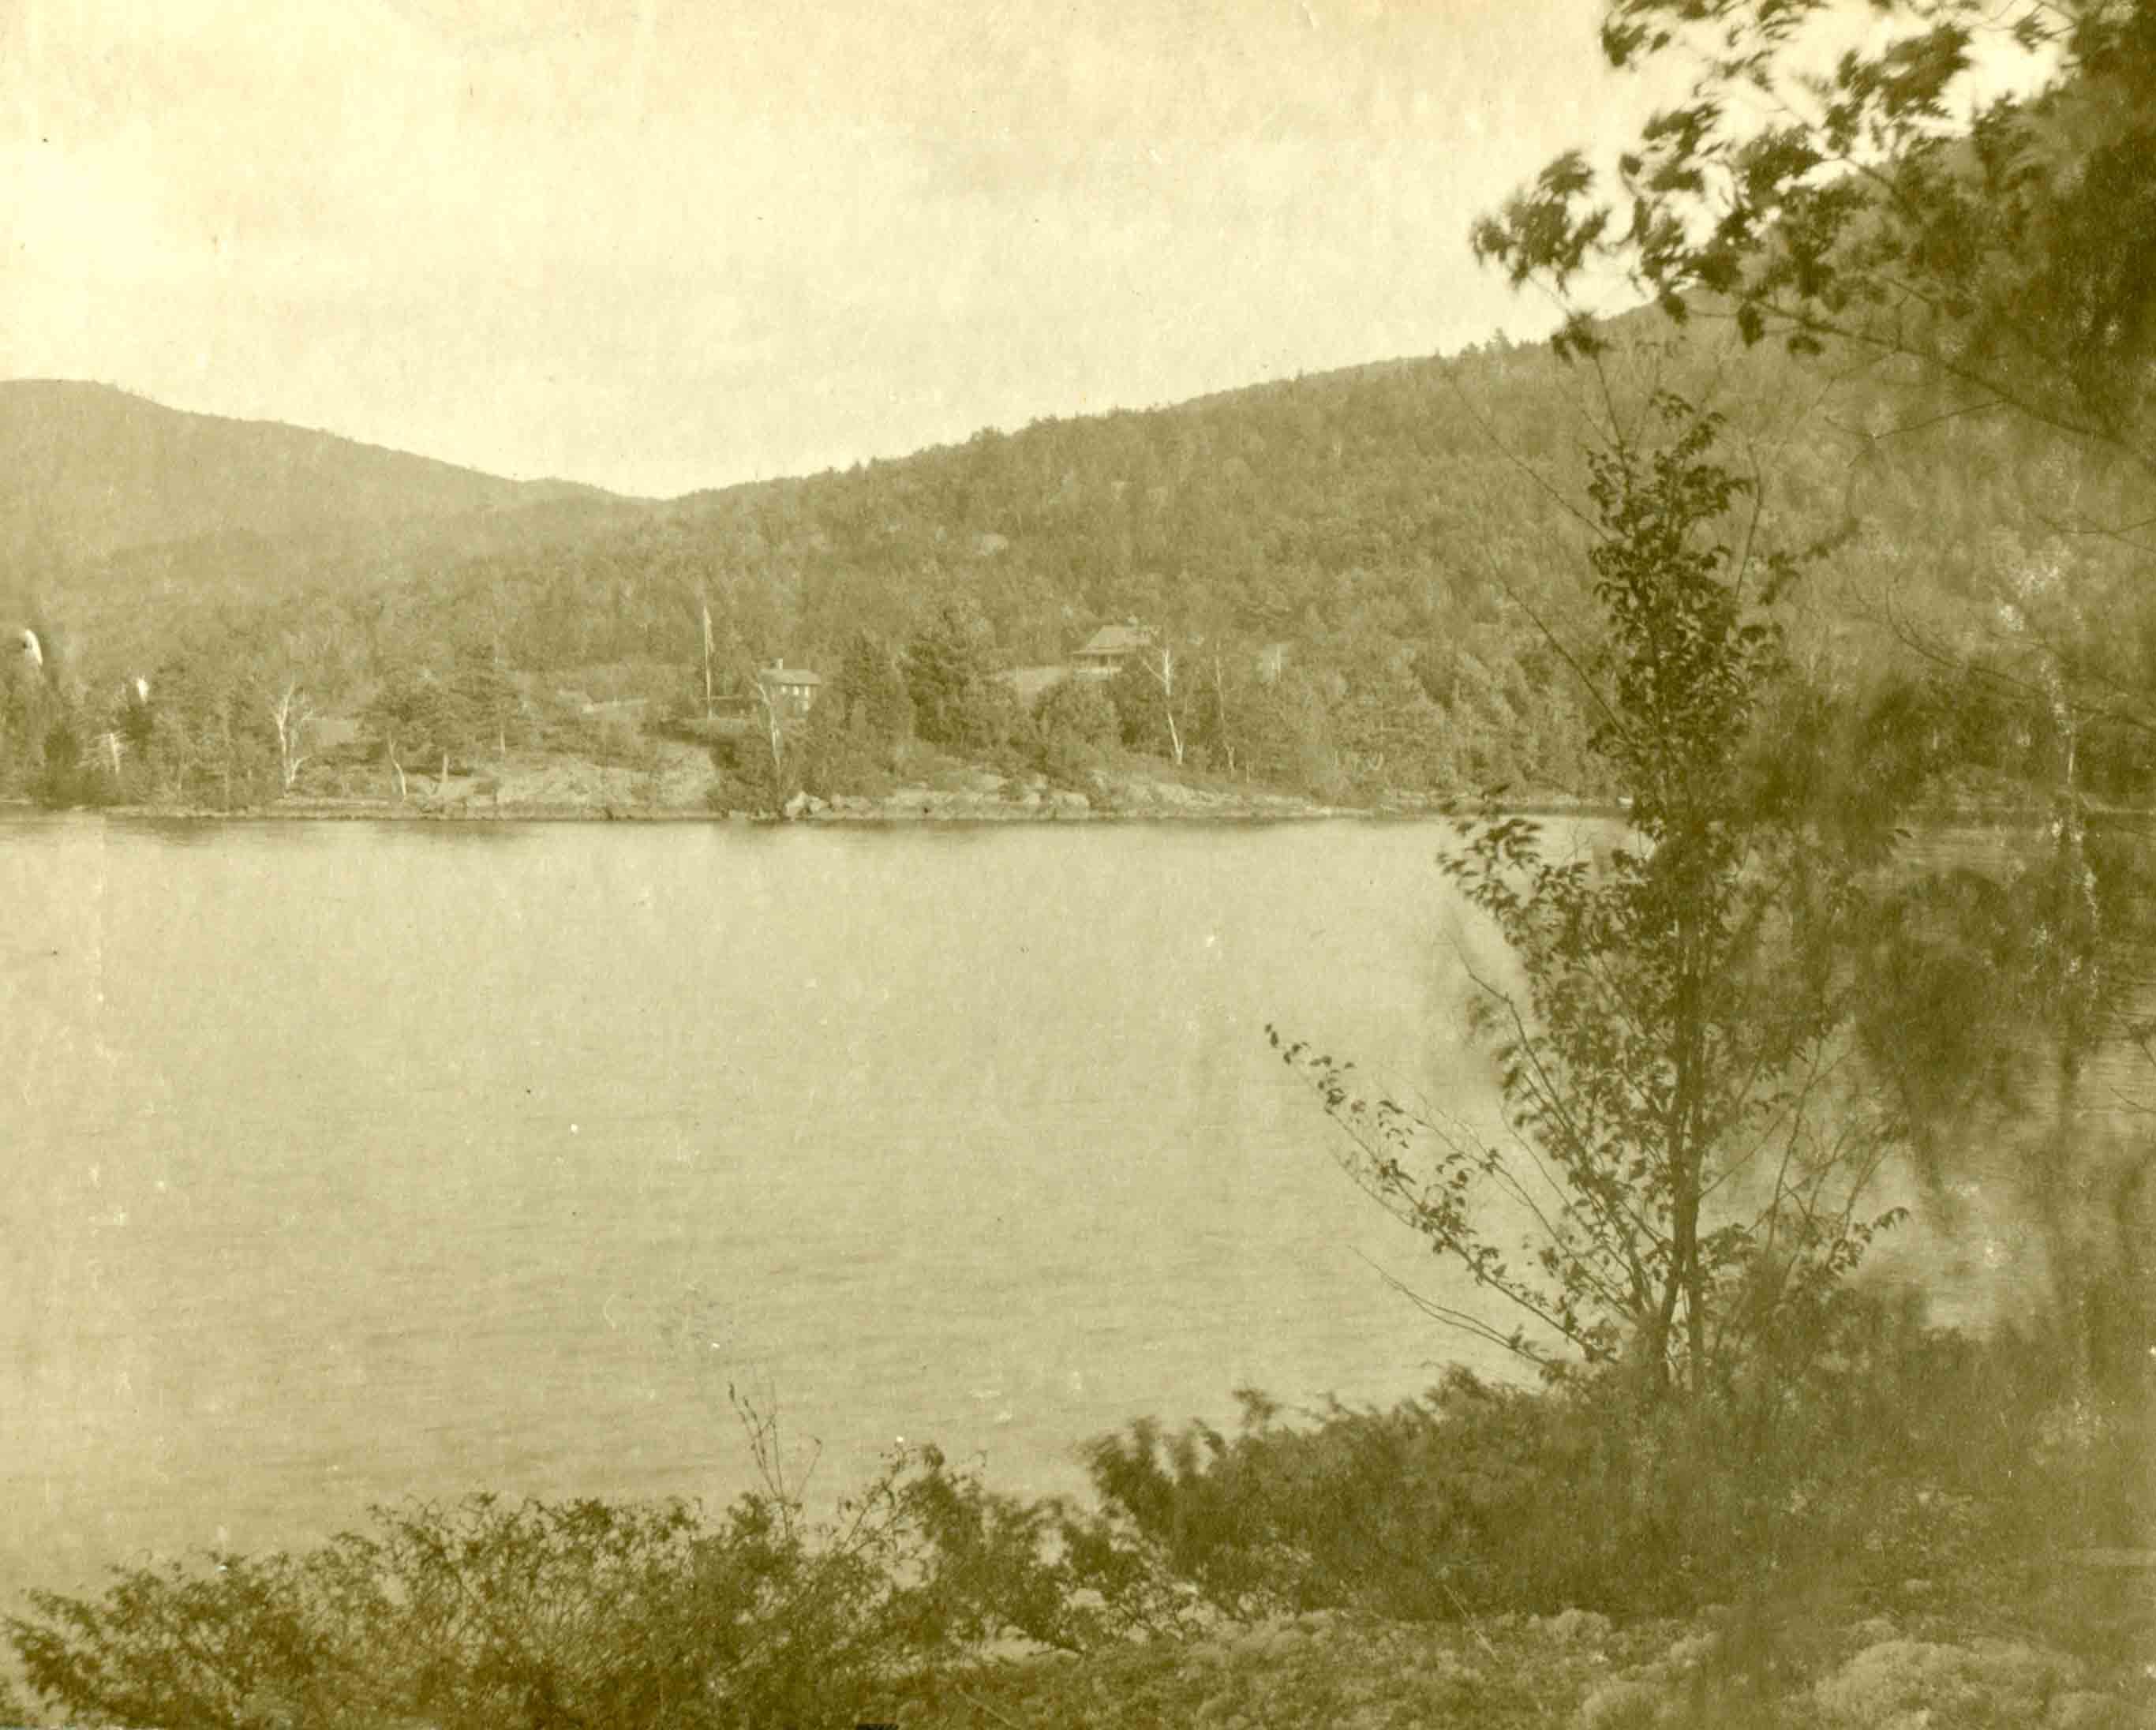 View Near Huletts,1898-99